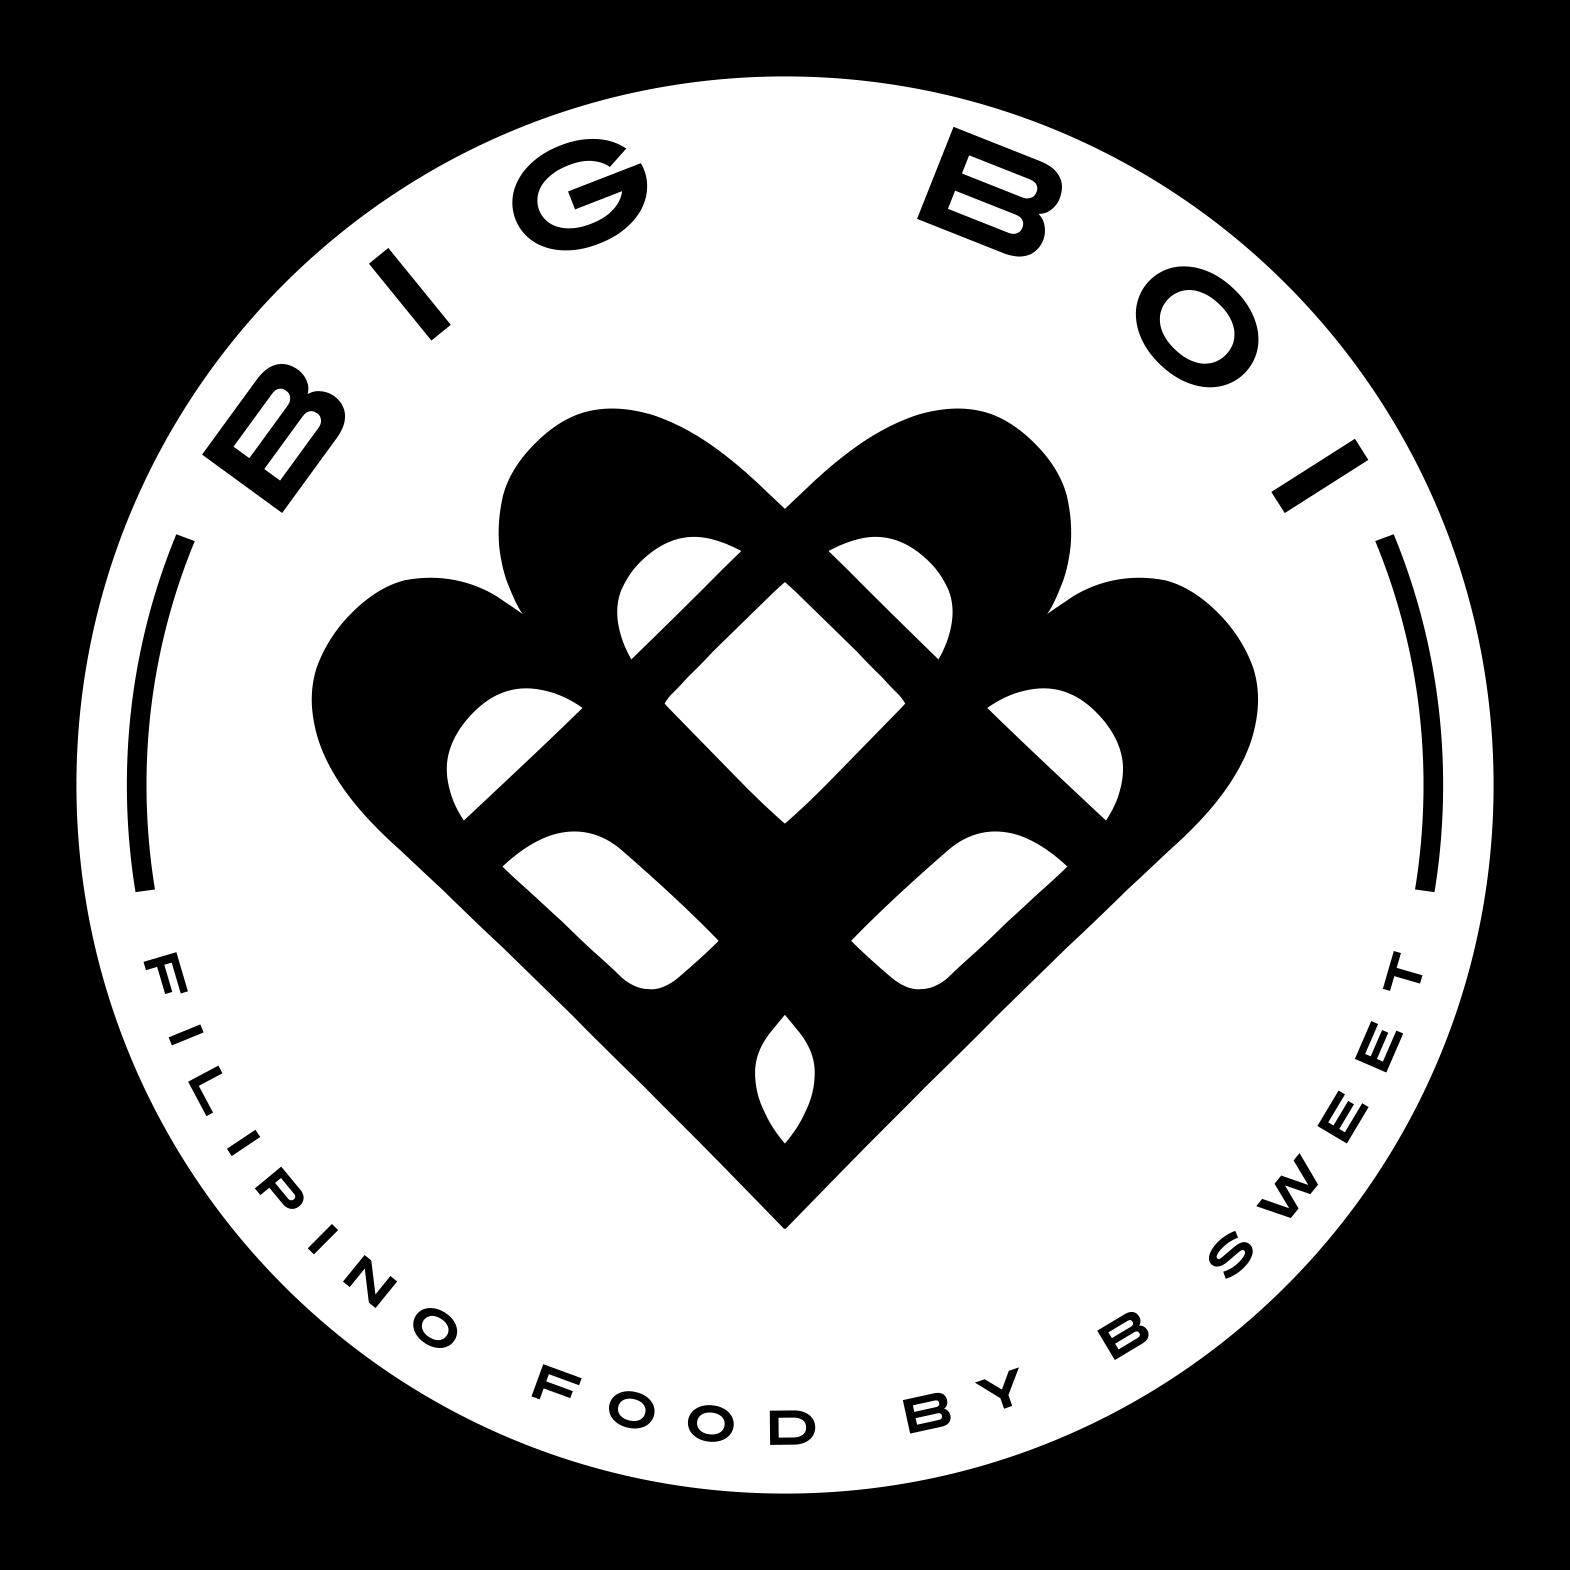 Big boi filipino comfort food biocorpaavc